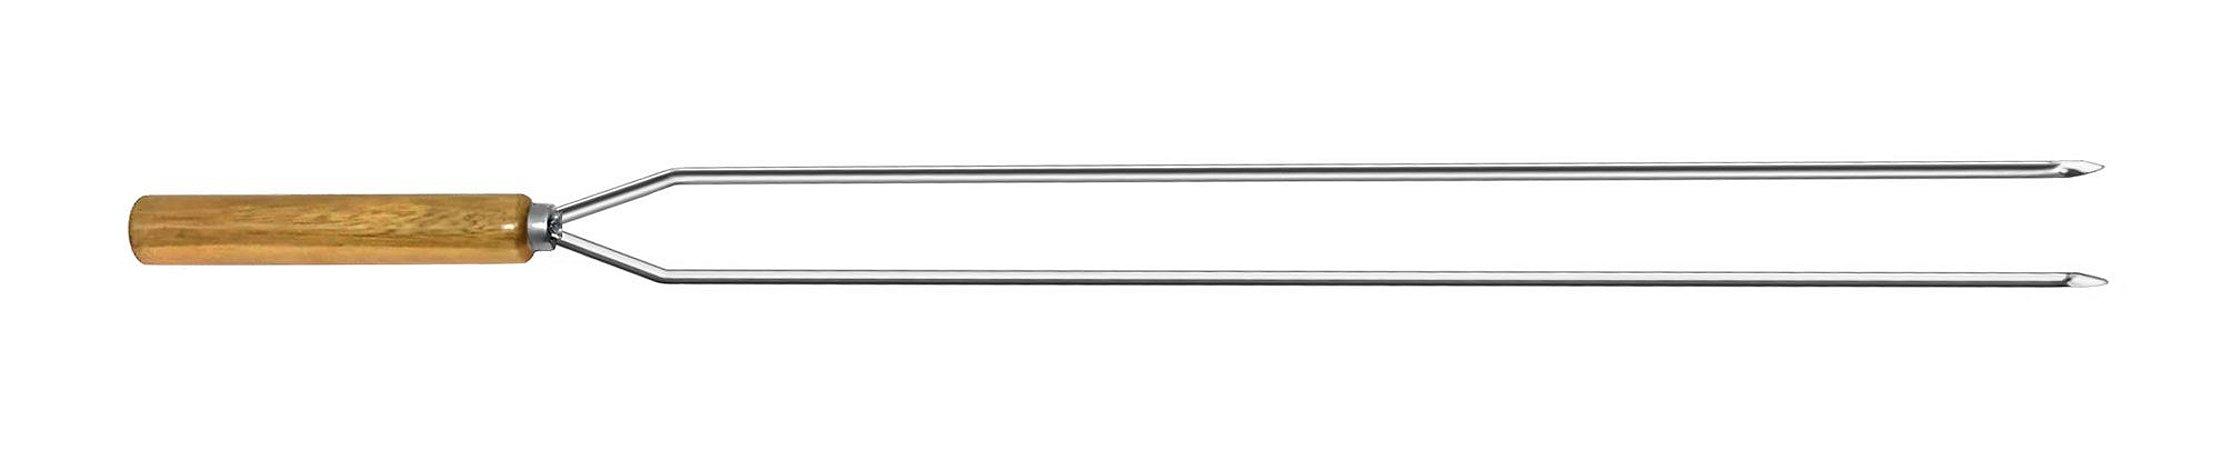 Espeto Inox Cupim Duplo 115 cm x 2 mm